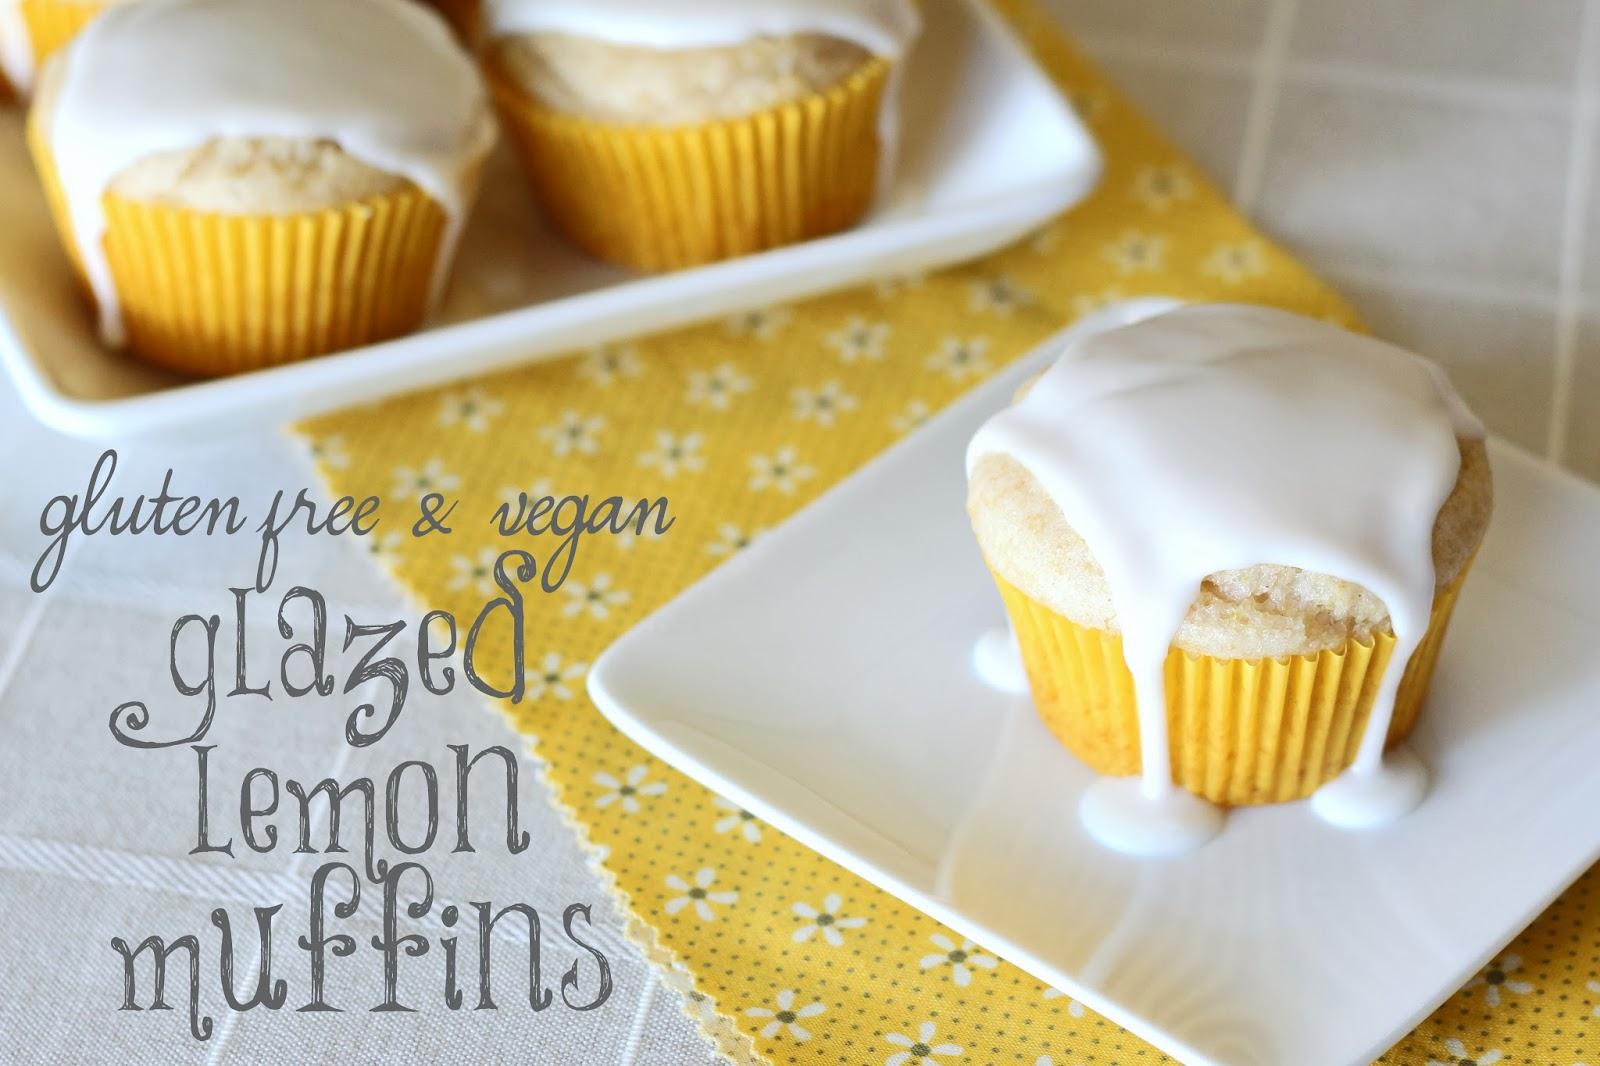 ... ...gluten free vegan glazed lemon muffins - Sarah Bakes Gluten Free